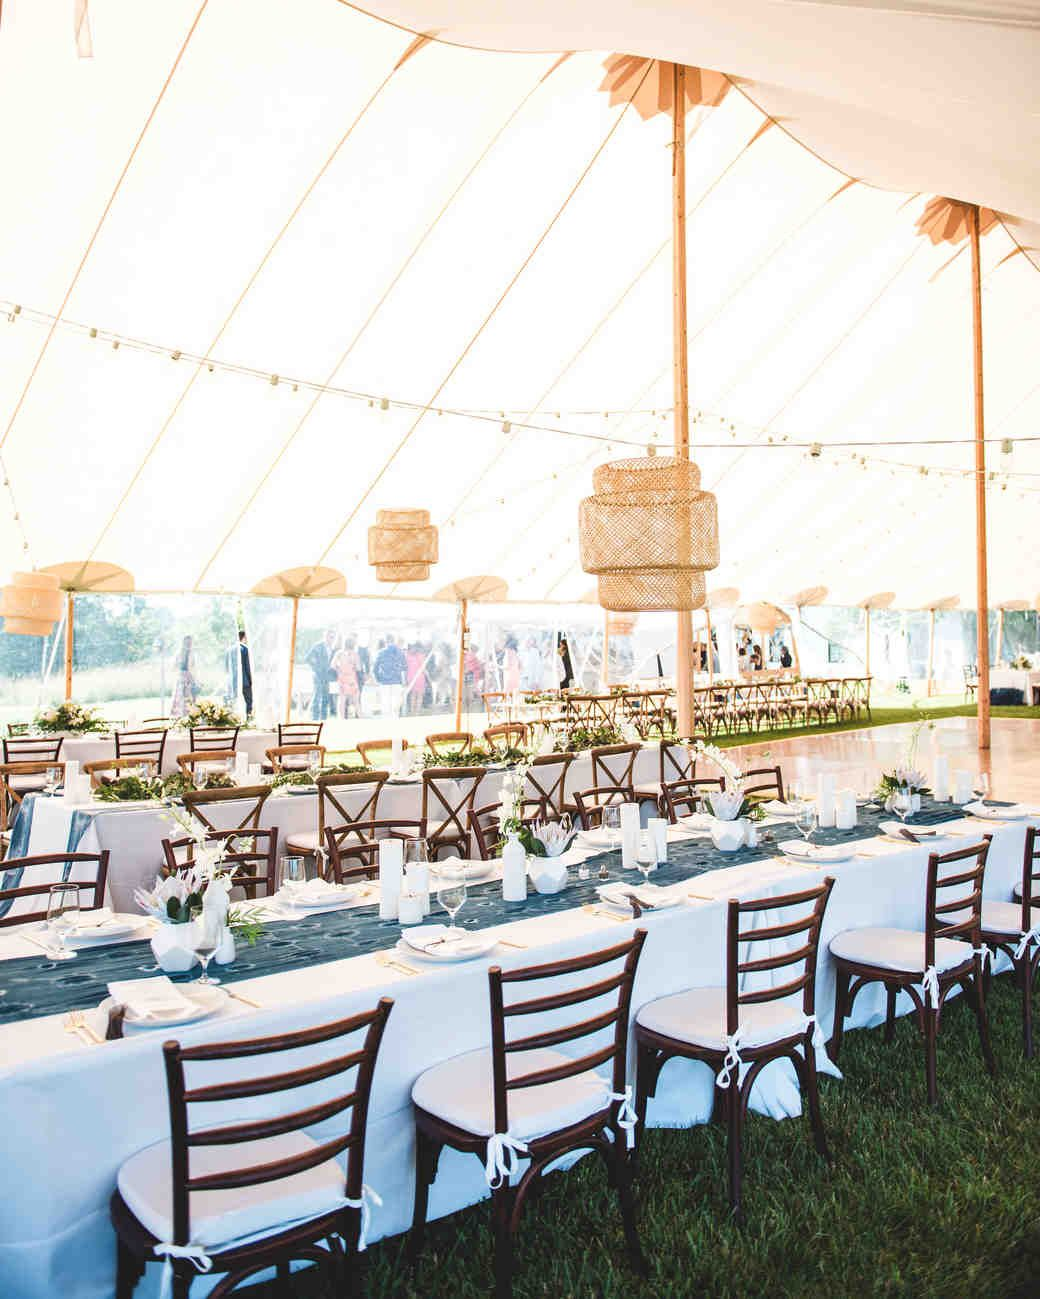 katie simon wedding tent | Wedding Scrapbook | Pinterest | Weddings ...